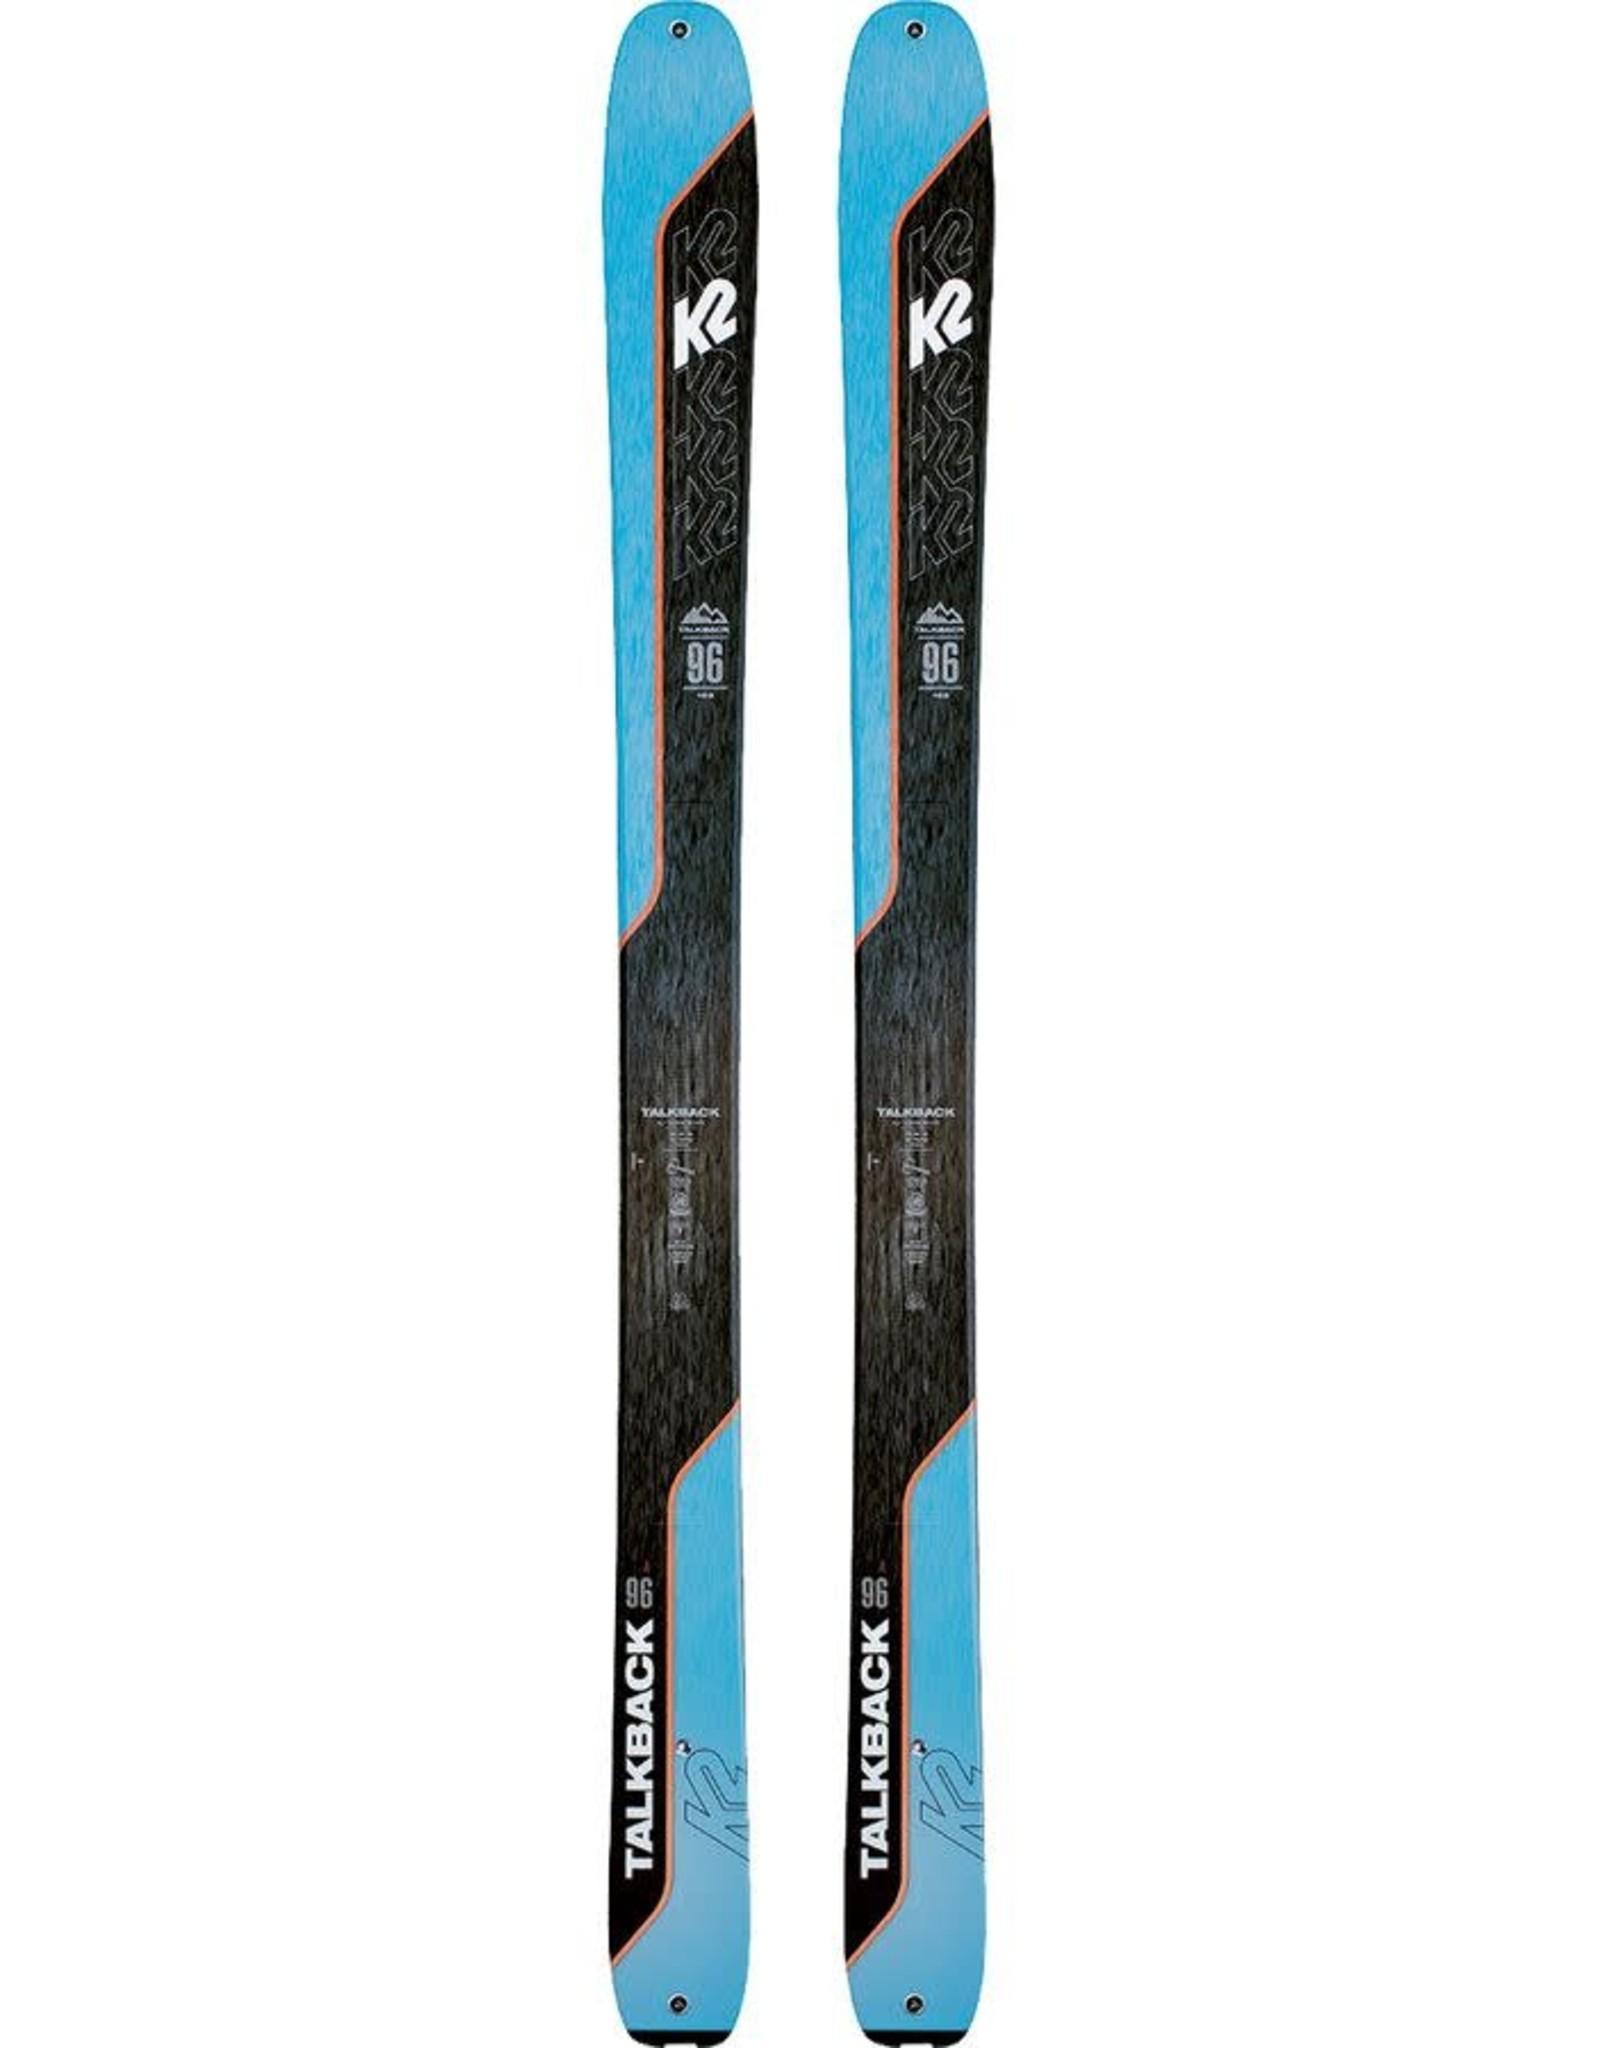 K2 K2 Skis TALKBACK 96 (20/21)